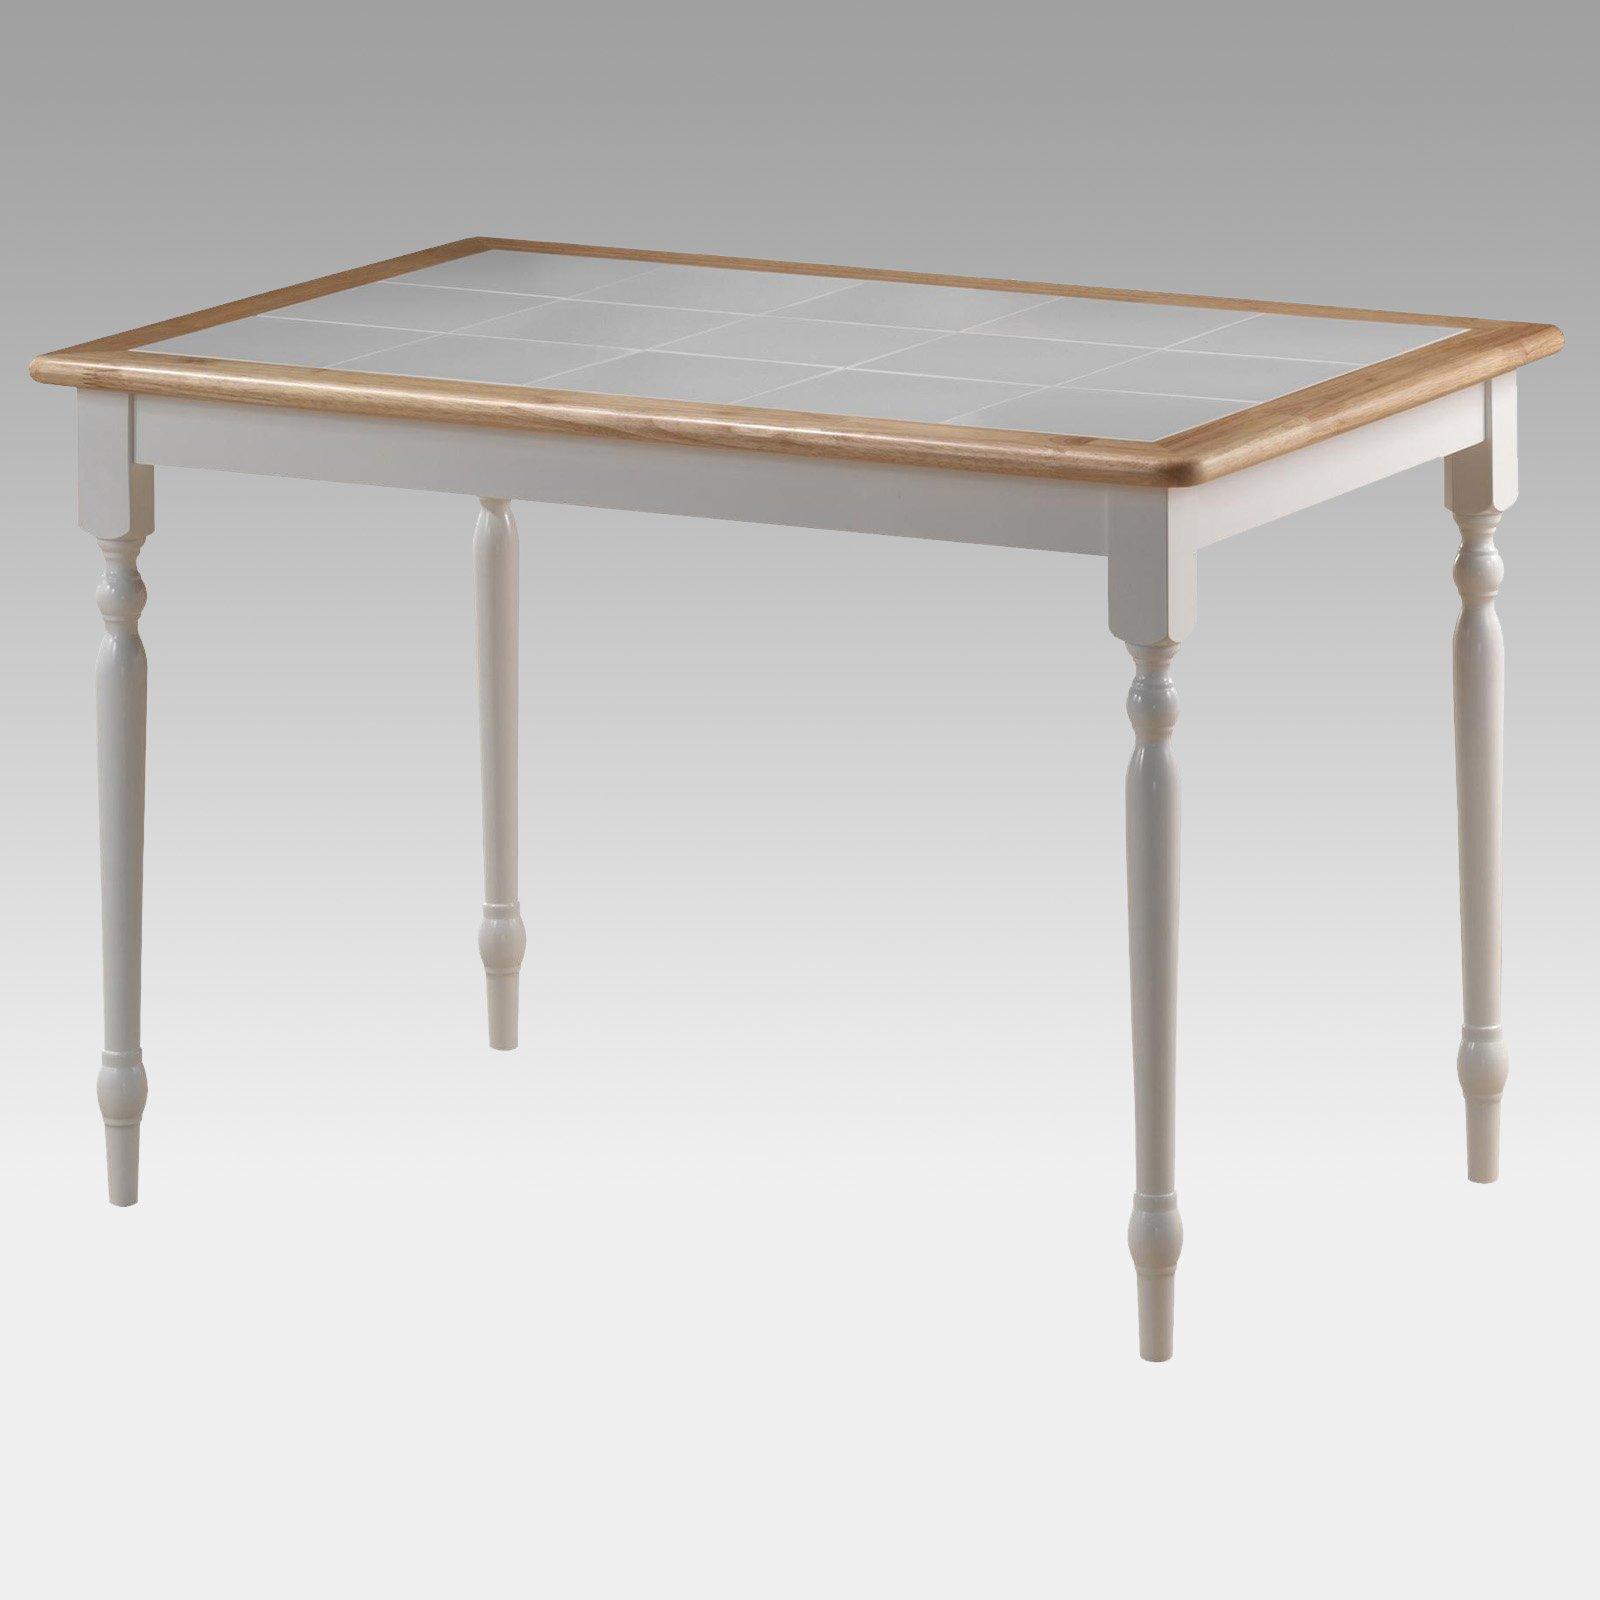 small rectangular kitchen table small rectangular kitchen table Elegant Kitchen Rectangluar Table With White Color Elegant Small Rectangular